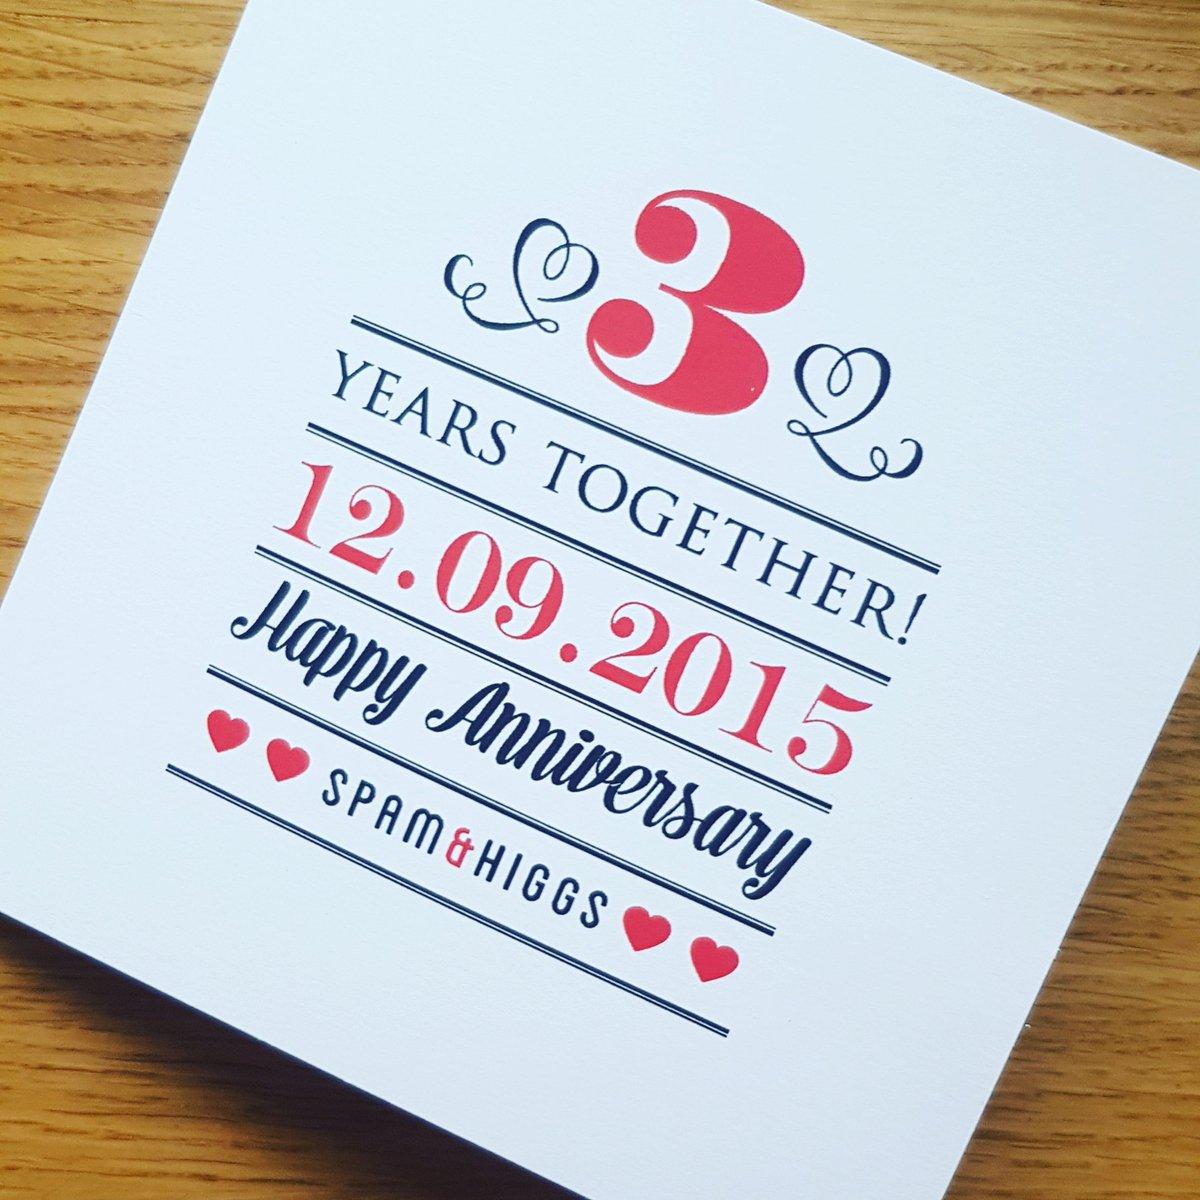 3year Wedding Anniversary.Pamela Higgins On Twitter Happy 3 Year Wedding Anniversary